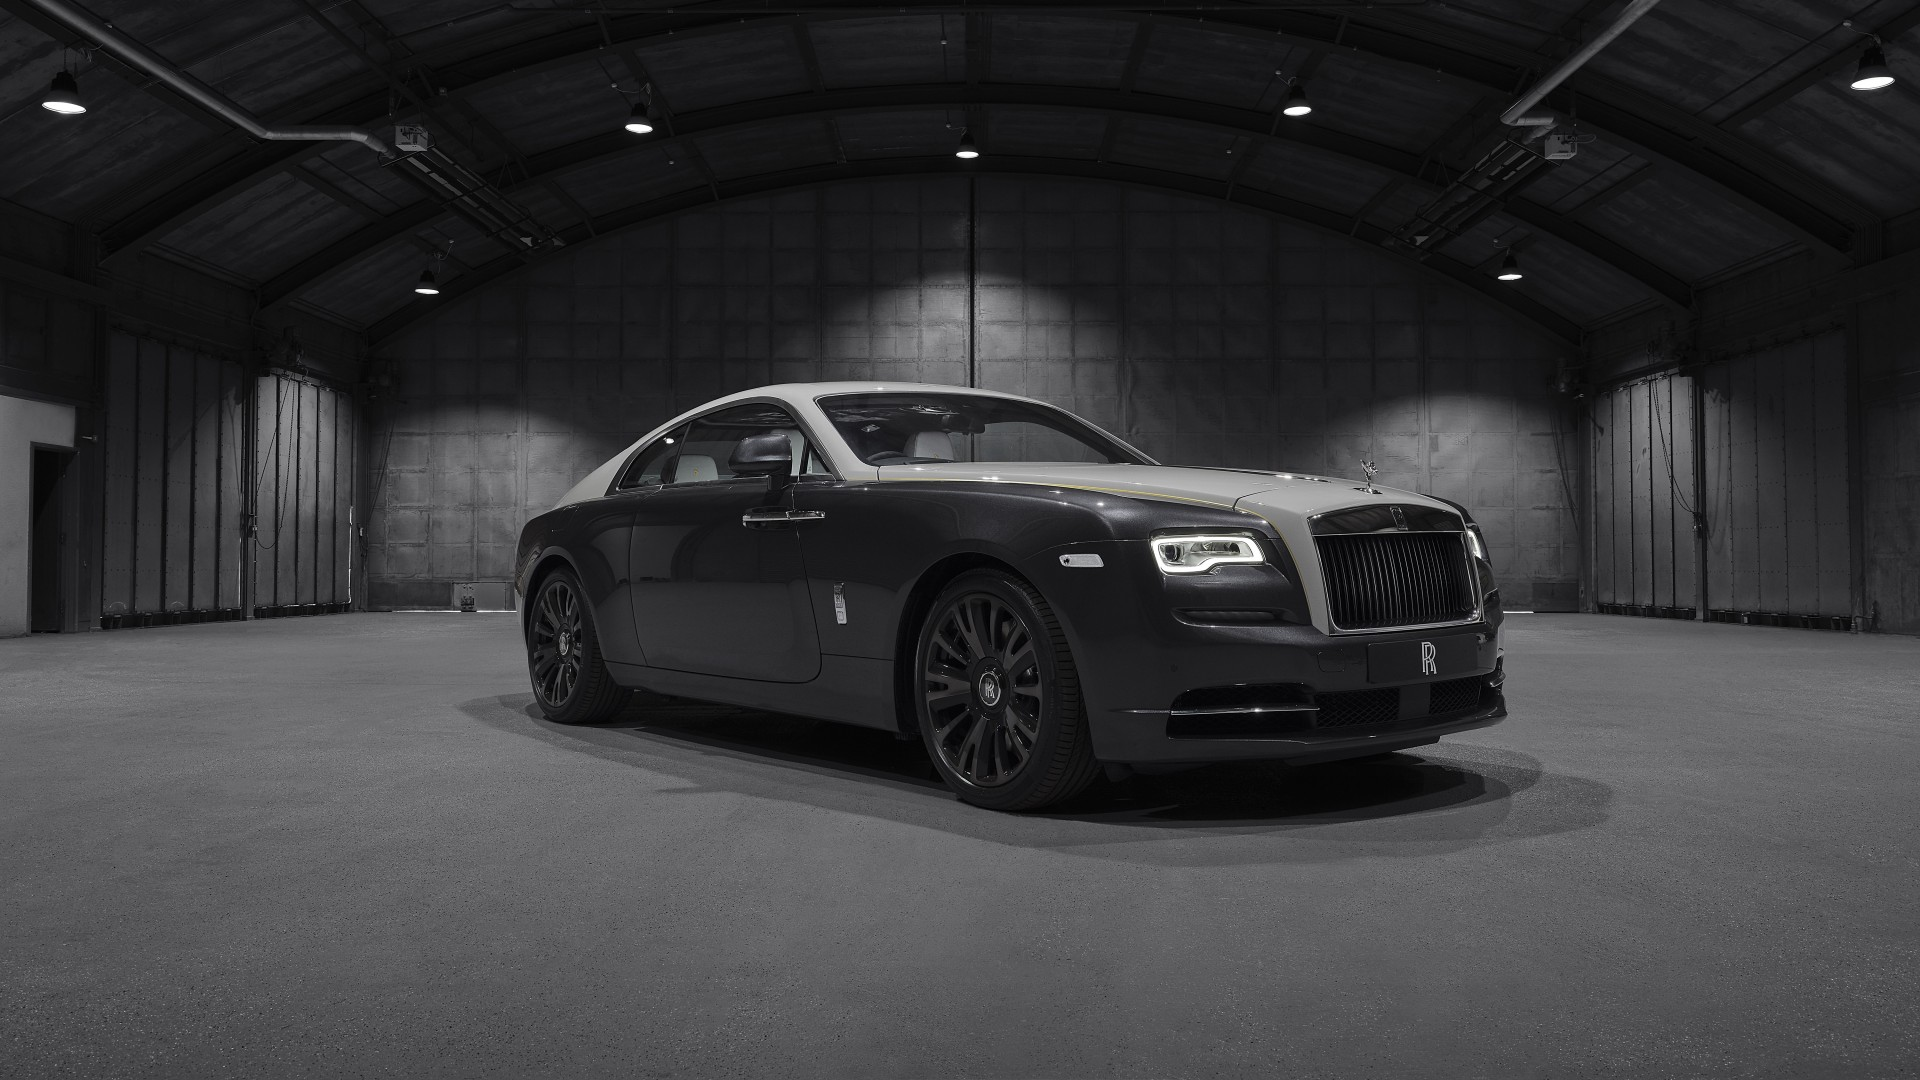 Permalink to Rolls Royce Wraith 2019